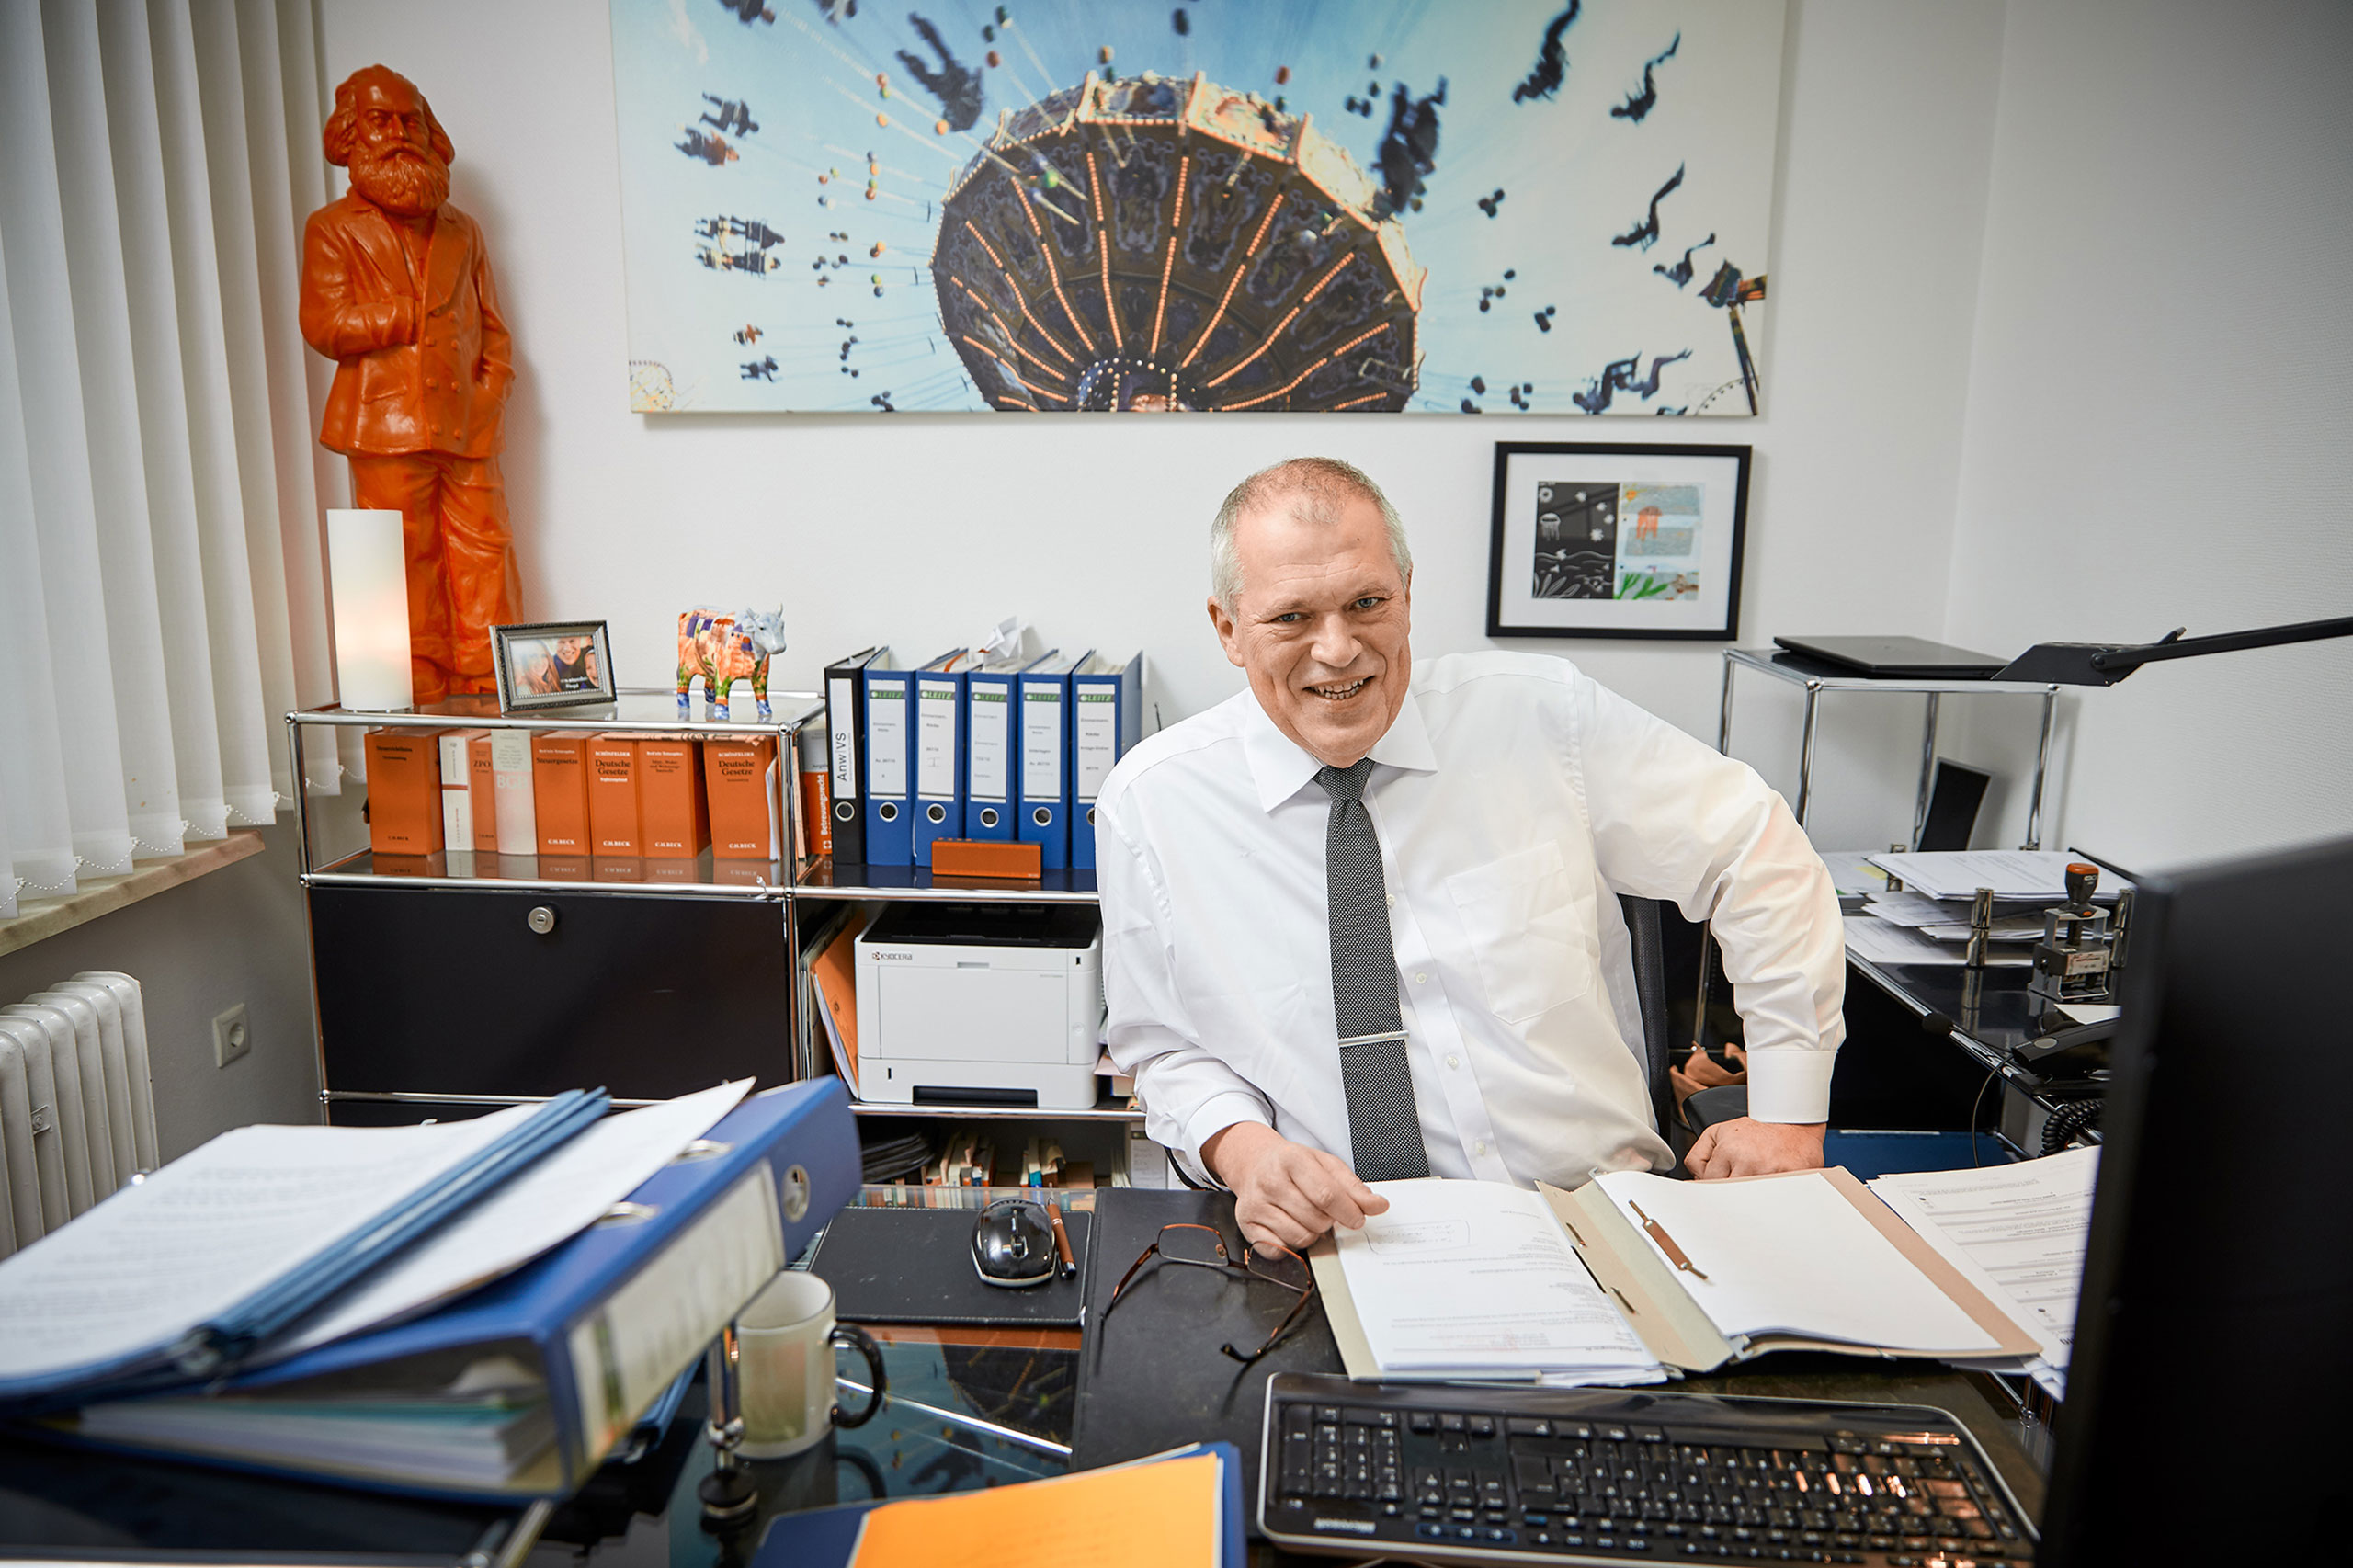 Rechtsanwalt Martin Wegner